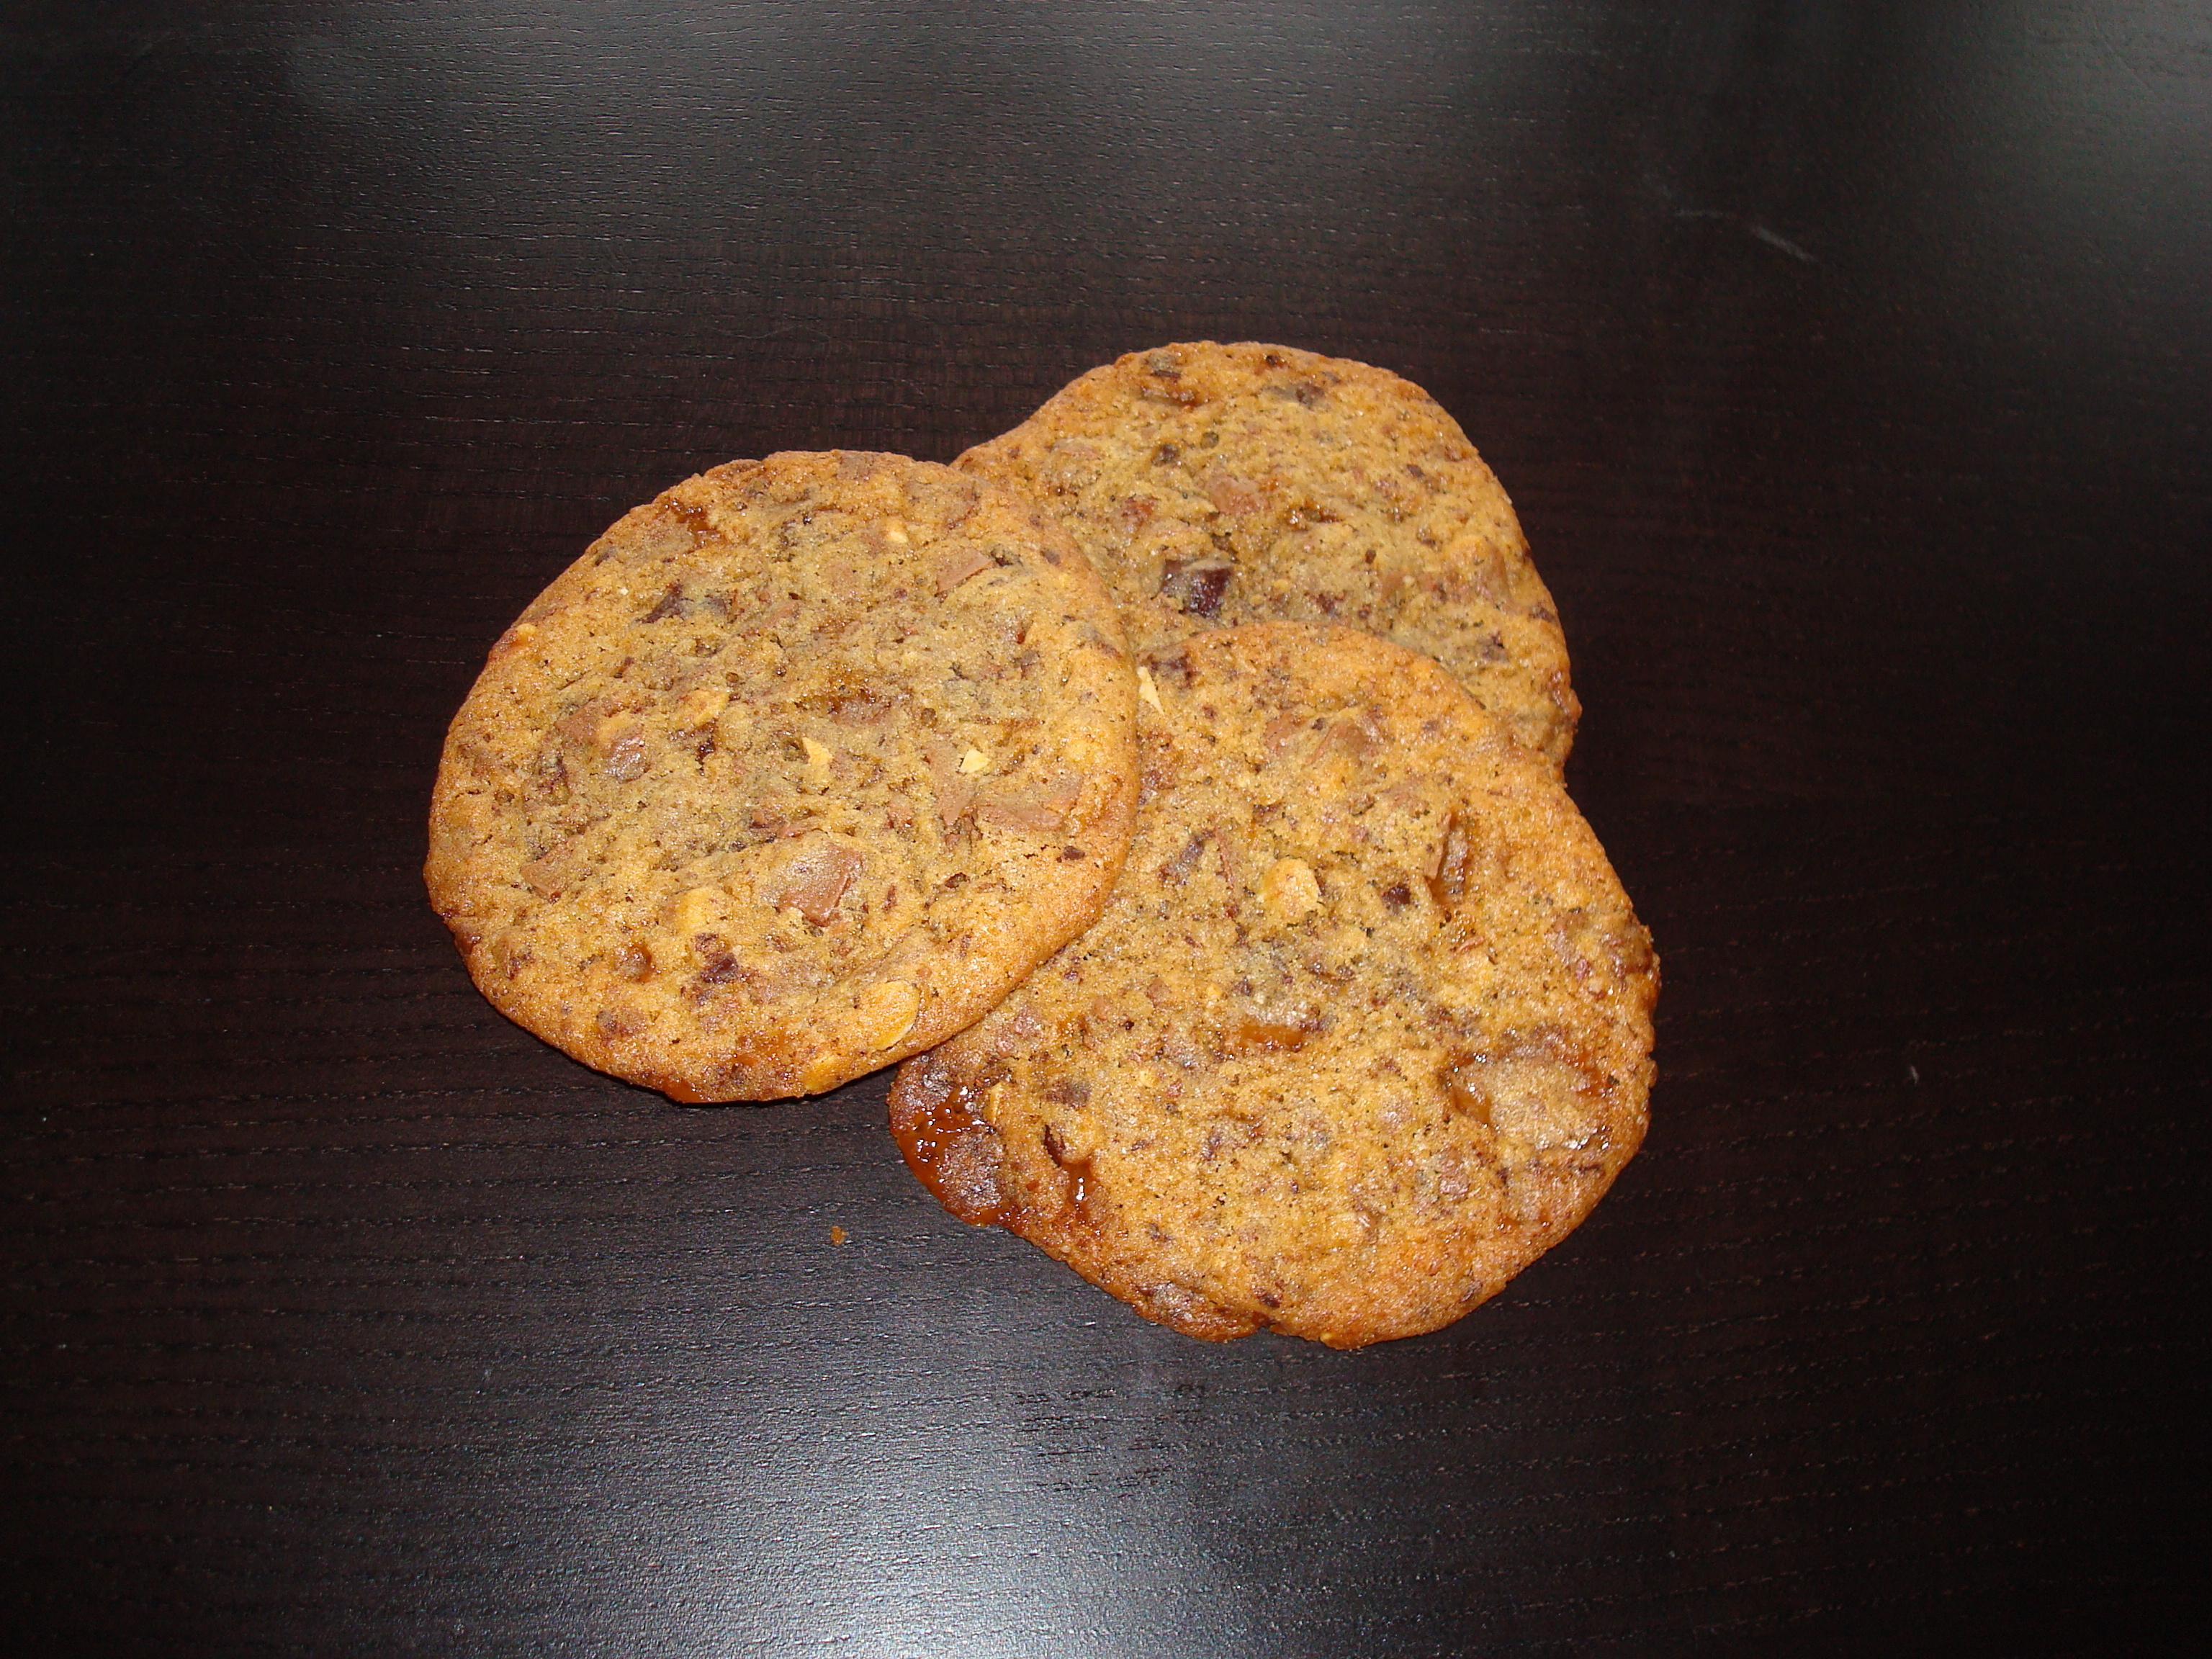 Marabou cookies